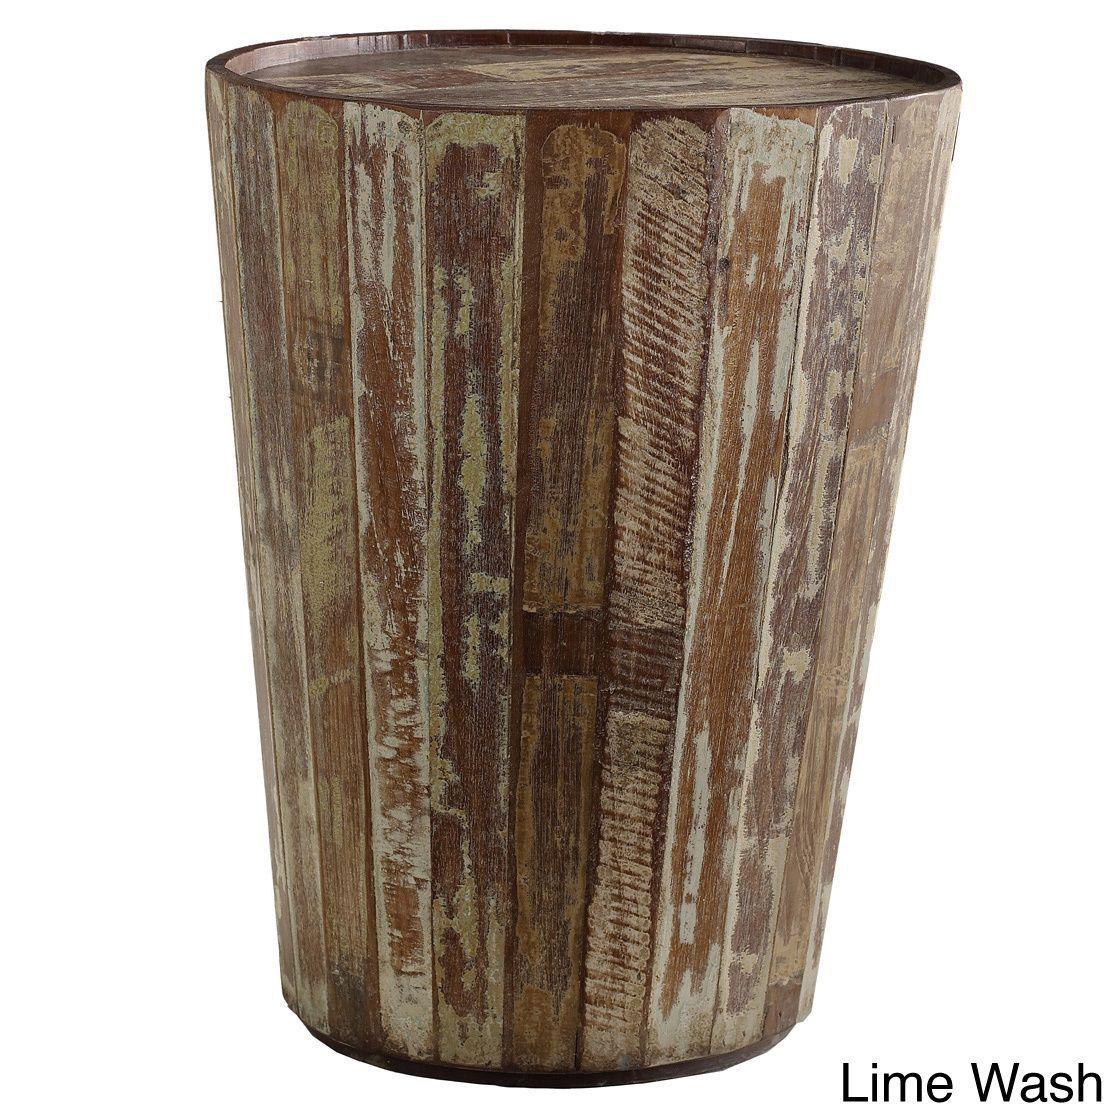 Kosas Home Hamshire Barrel Side Table (Hamshire Barrel Side Table  Lime Wash ),